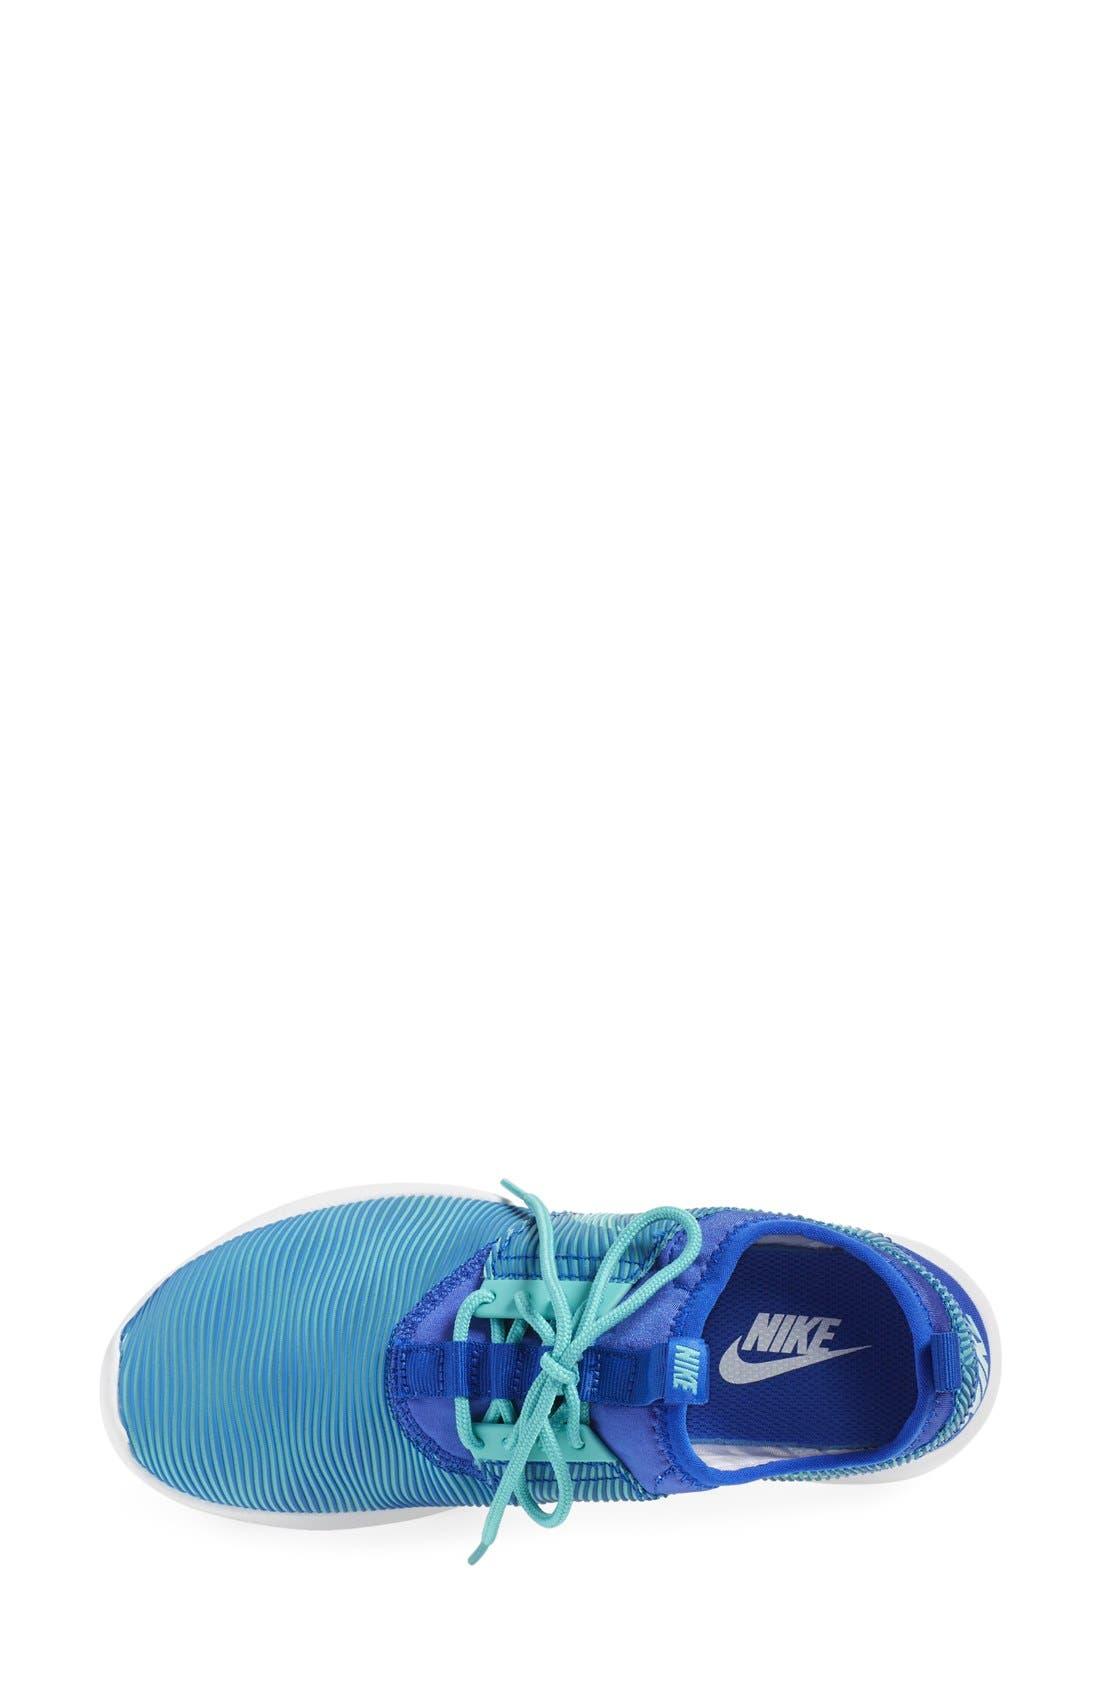 Juvenate Sneaker,                             Alternate thumbnail 148, color,